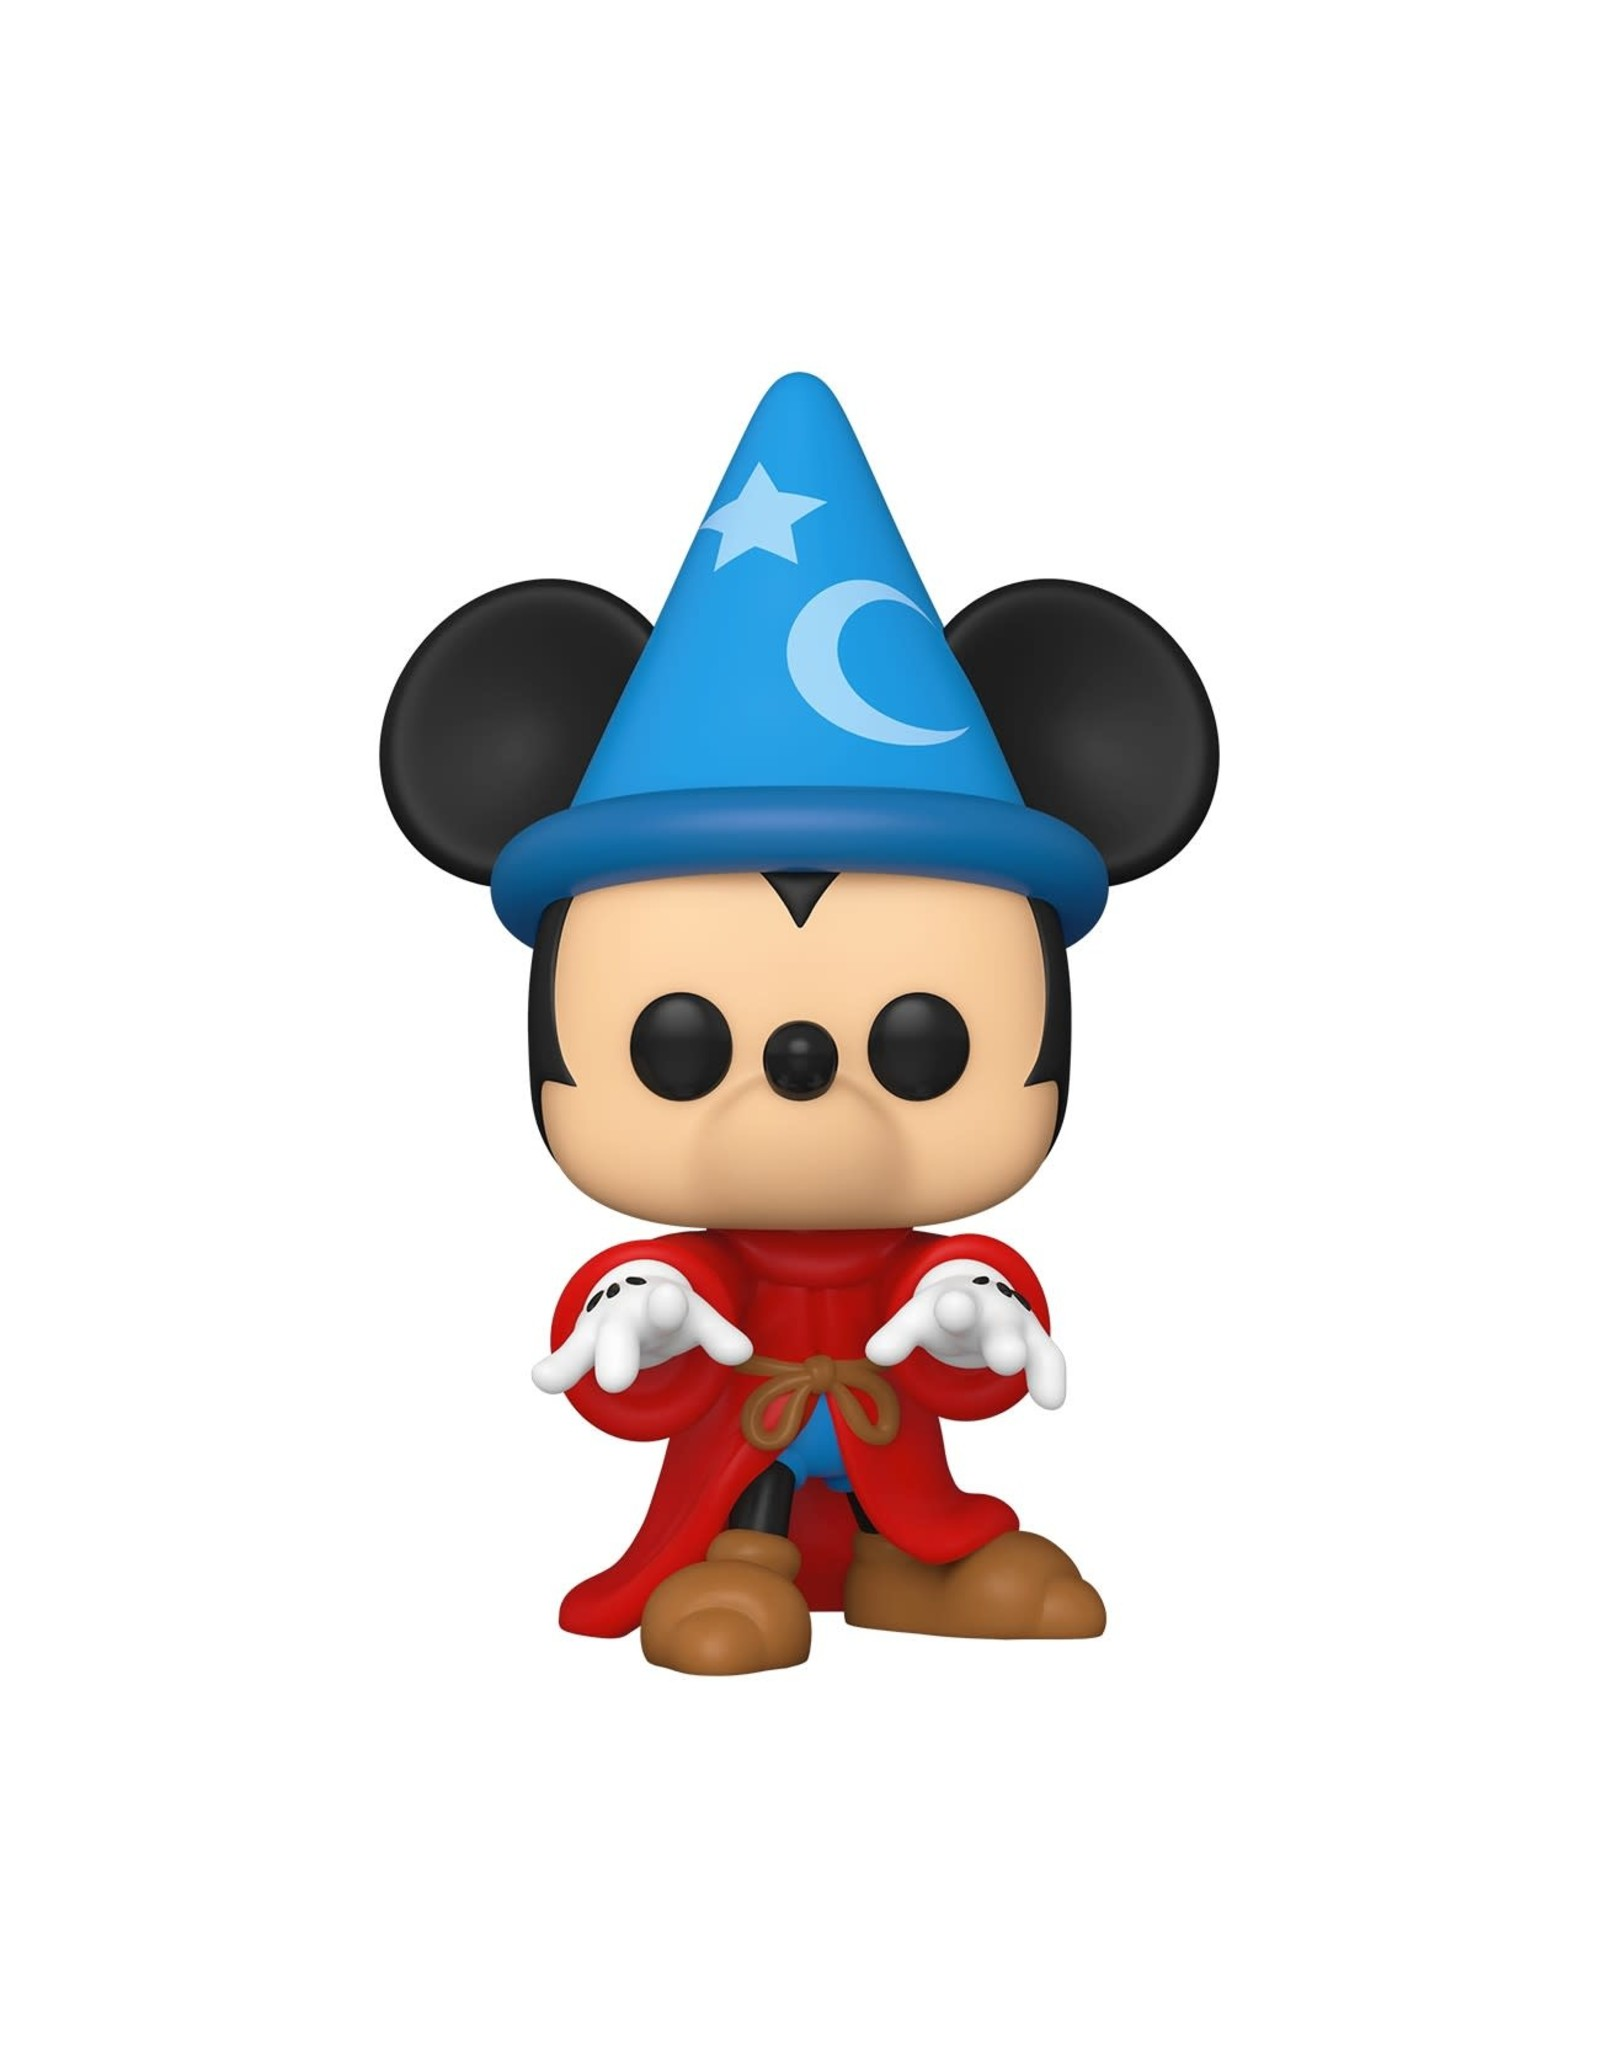 Funko Pop! Funko Pop! Disney nr990 Fantasia 80th - Sorcerer Mickey